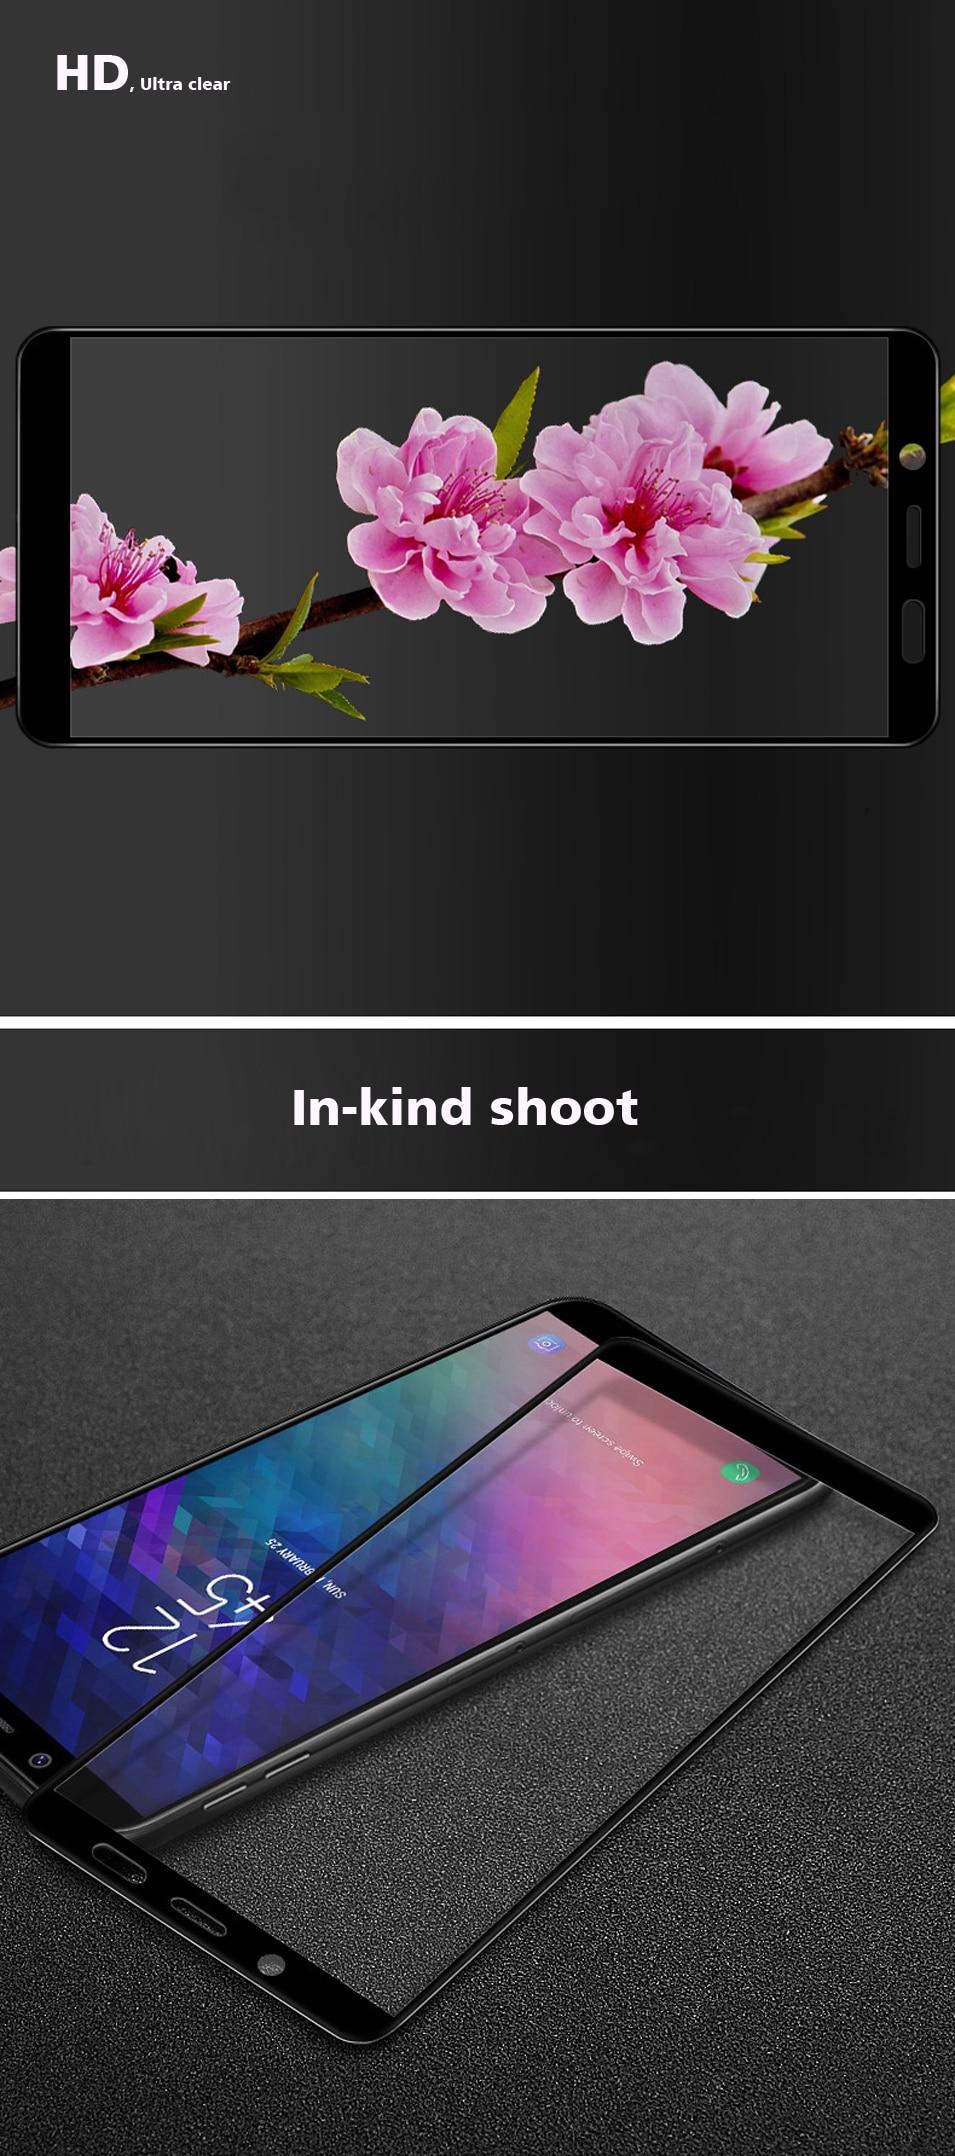 Full Cover Screen Tempered Glass for Samsung Galaxy J3 J4 J6 J7 J8 2018 J530 2017 Eurasian version Glass Screen Protector Film (7)